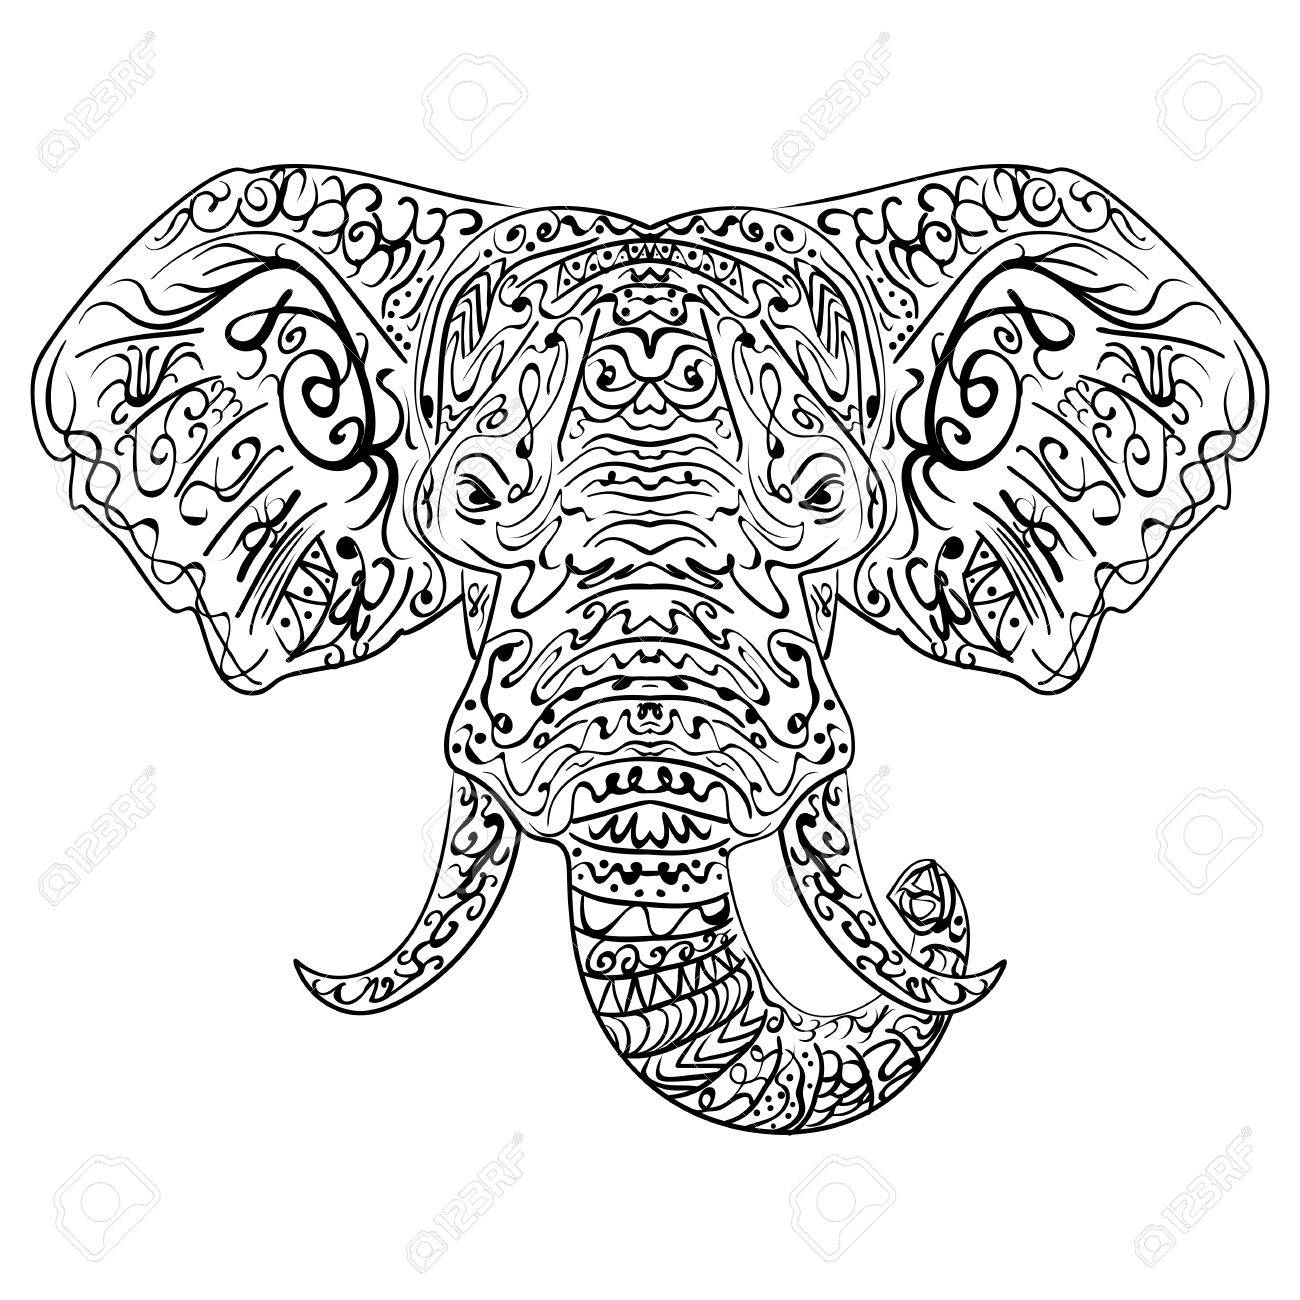 Ethnic Indian Elephant Boho Paisley. Freehand Sketch For Adult ...